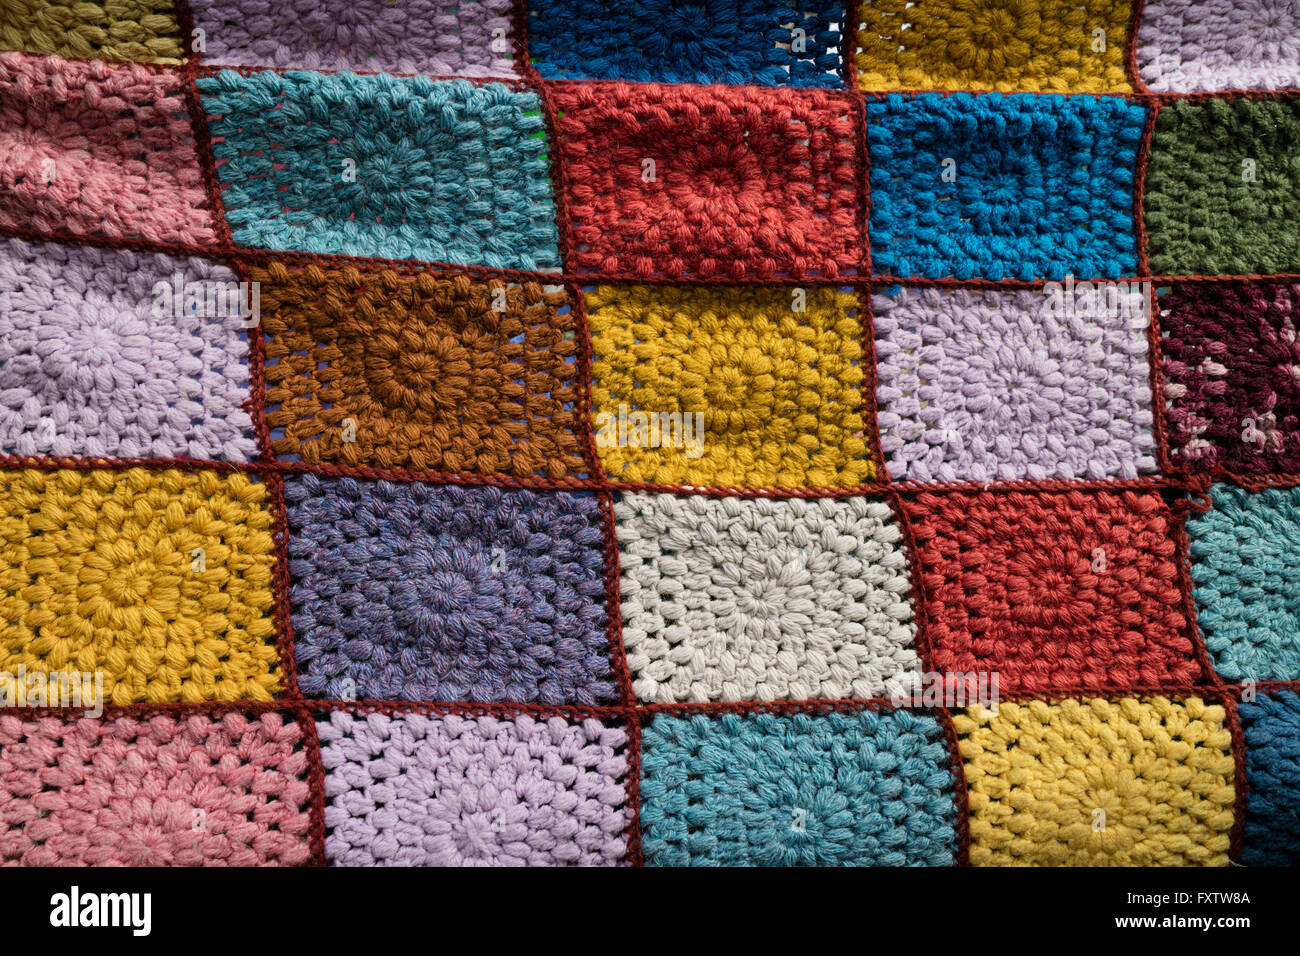 Colorful handmade crochet blanket on the market - Stock Image